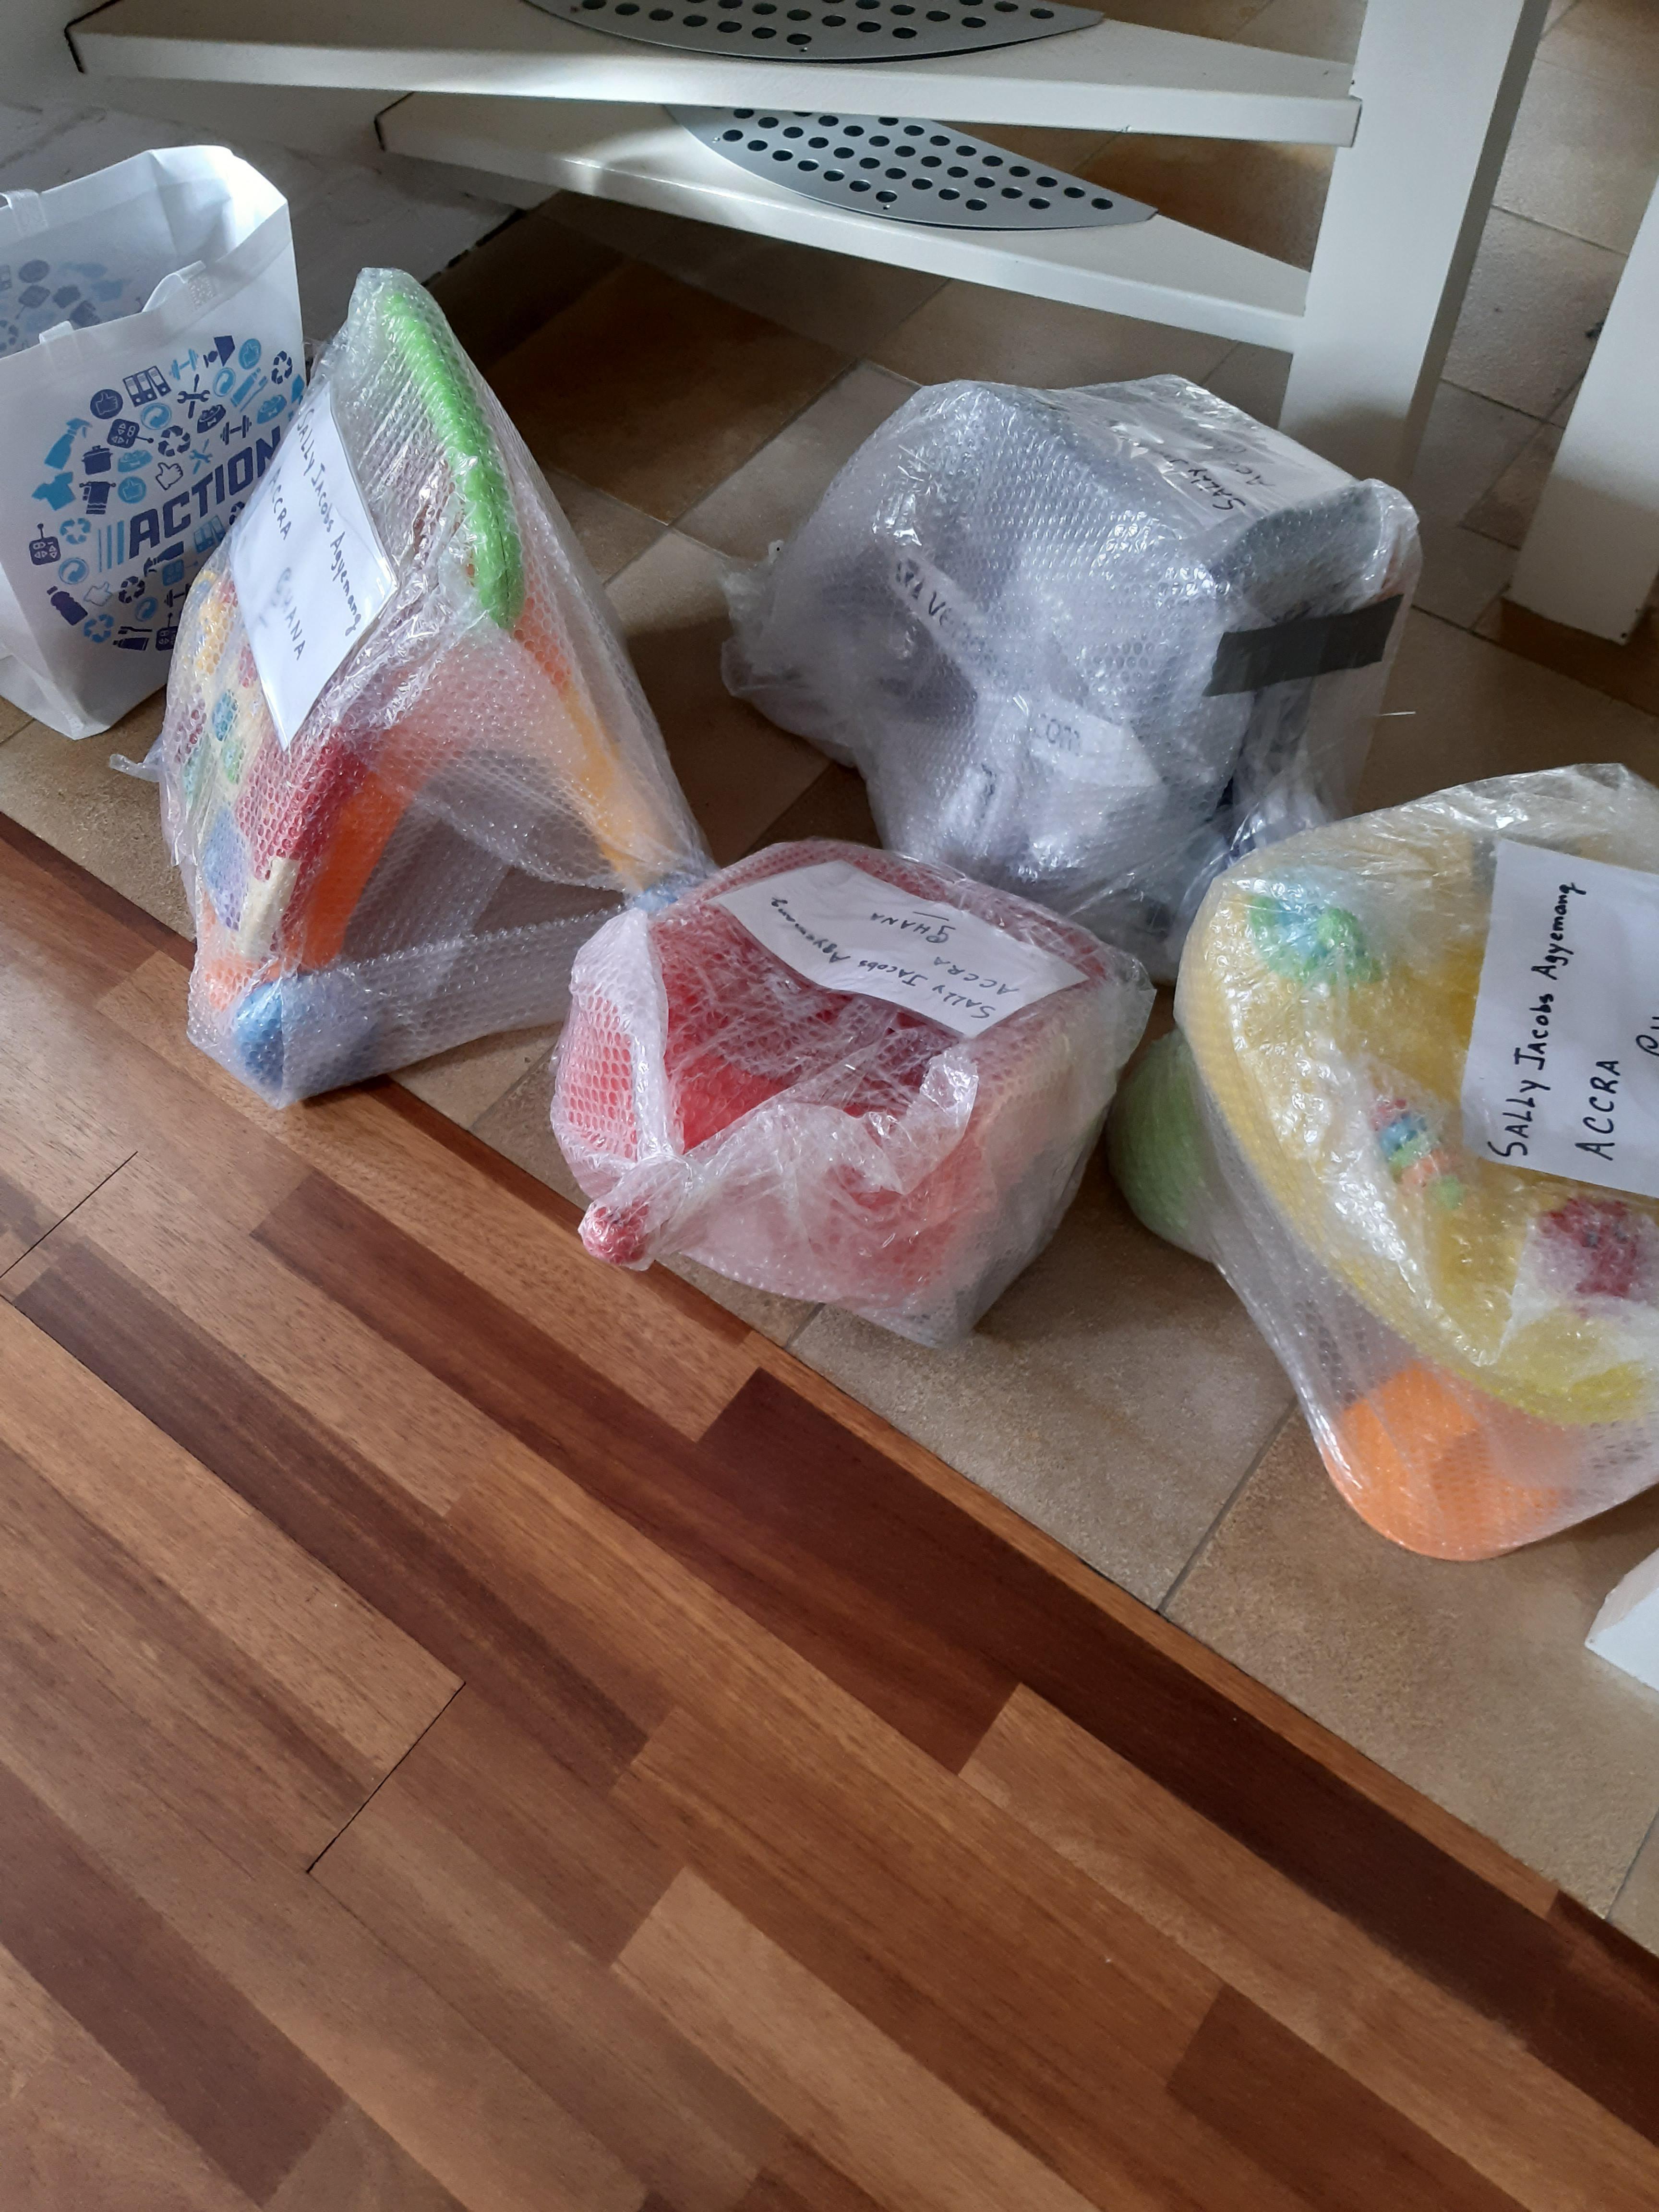 Noppenfolie standaard gebruik: Om plastic speelgoed te versturen naar weeshuis in Ghana